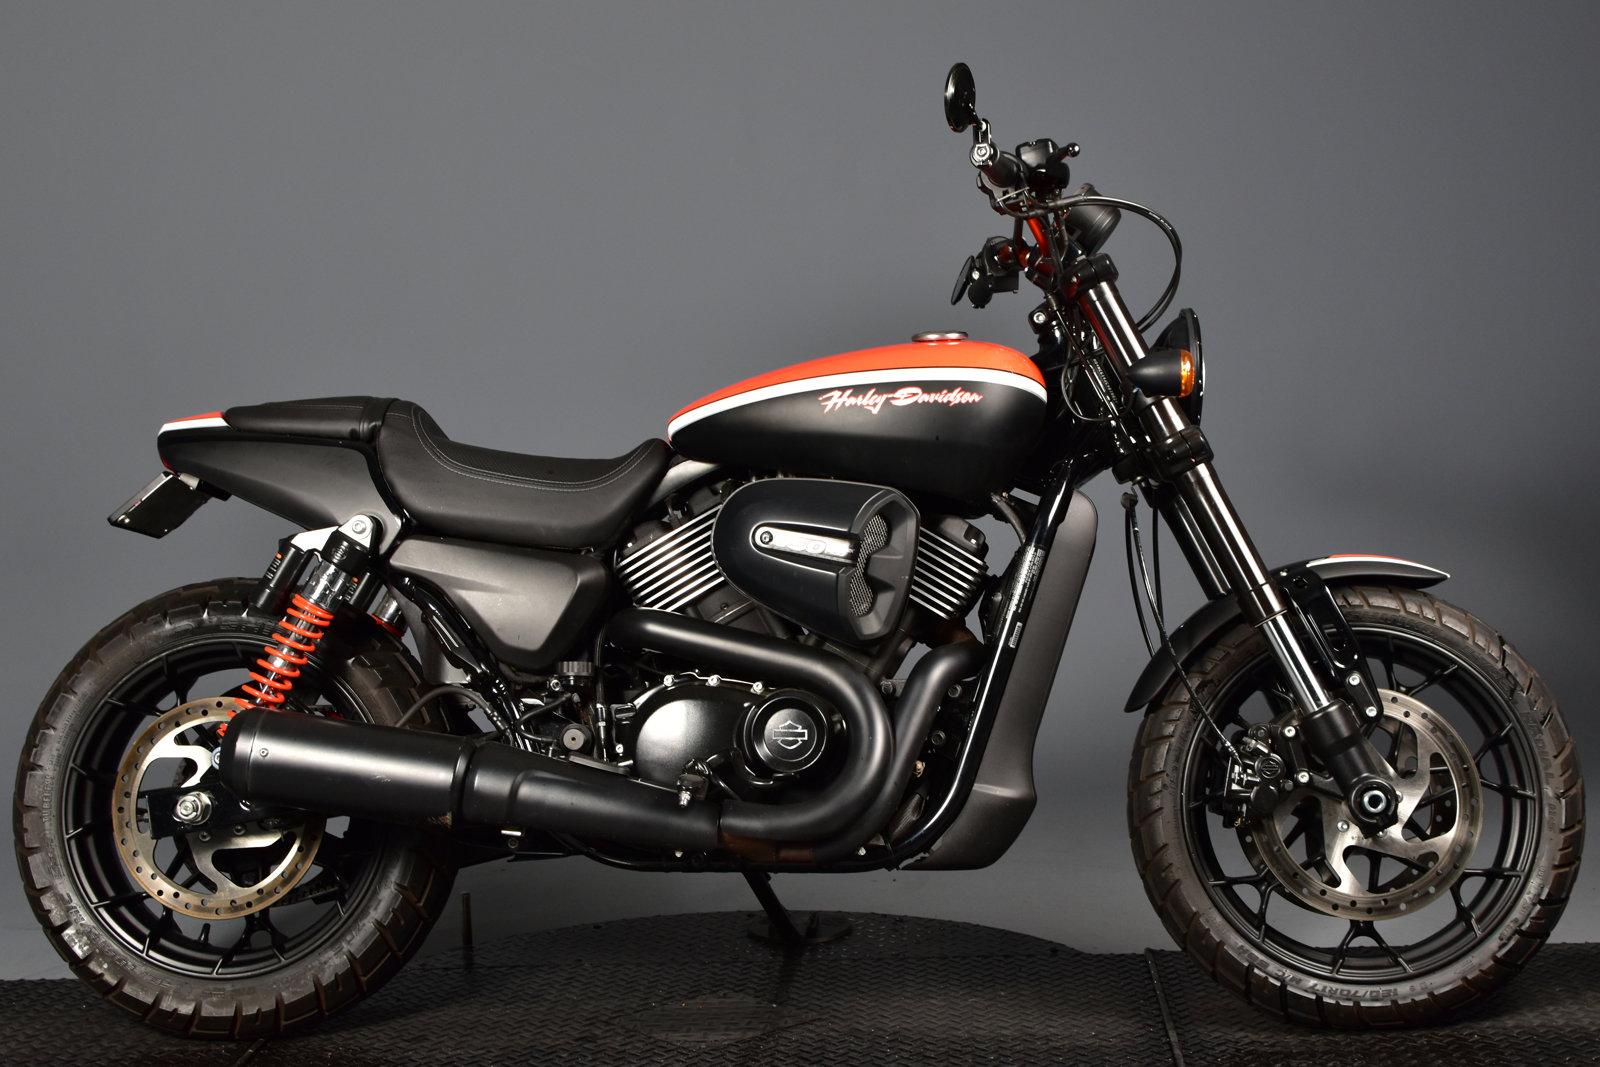 Pre-Owned 2018 Harley-Davidson Street Rod XG750A